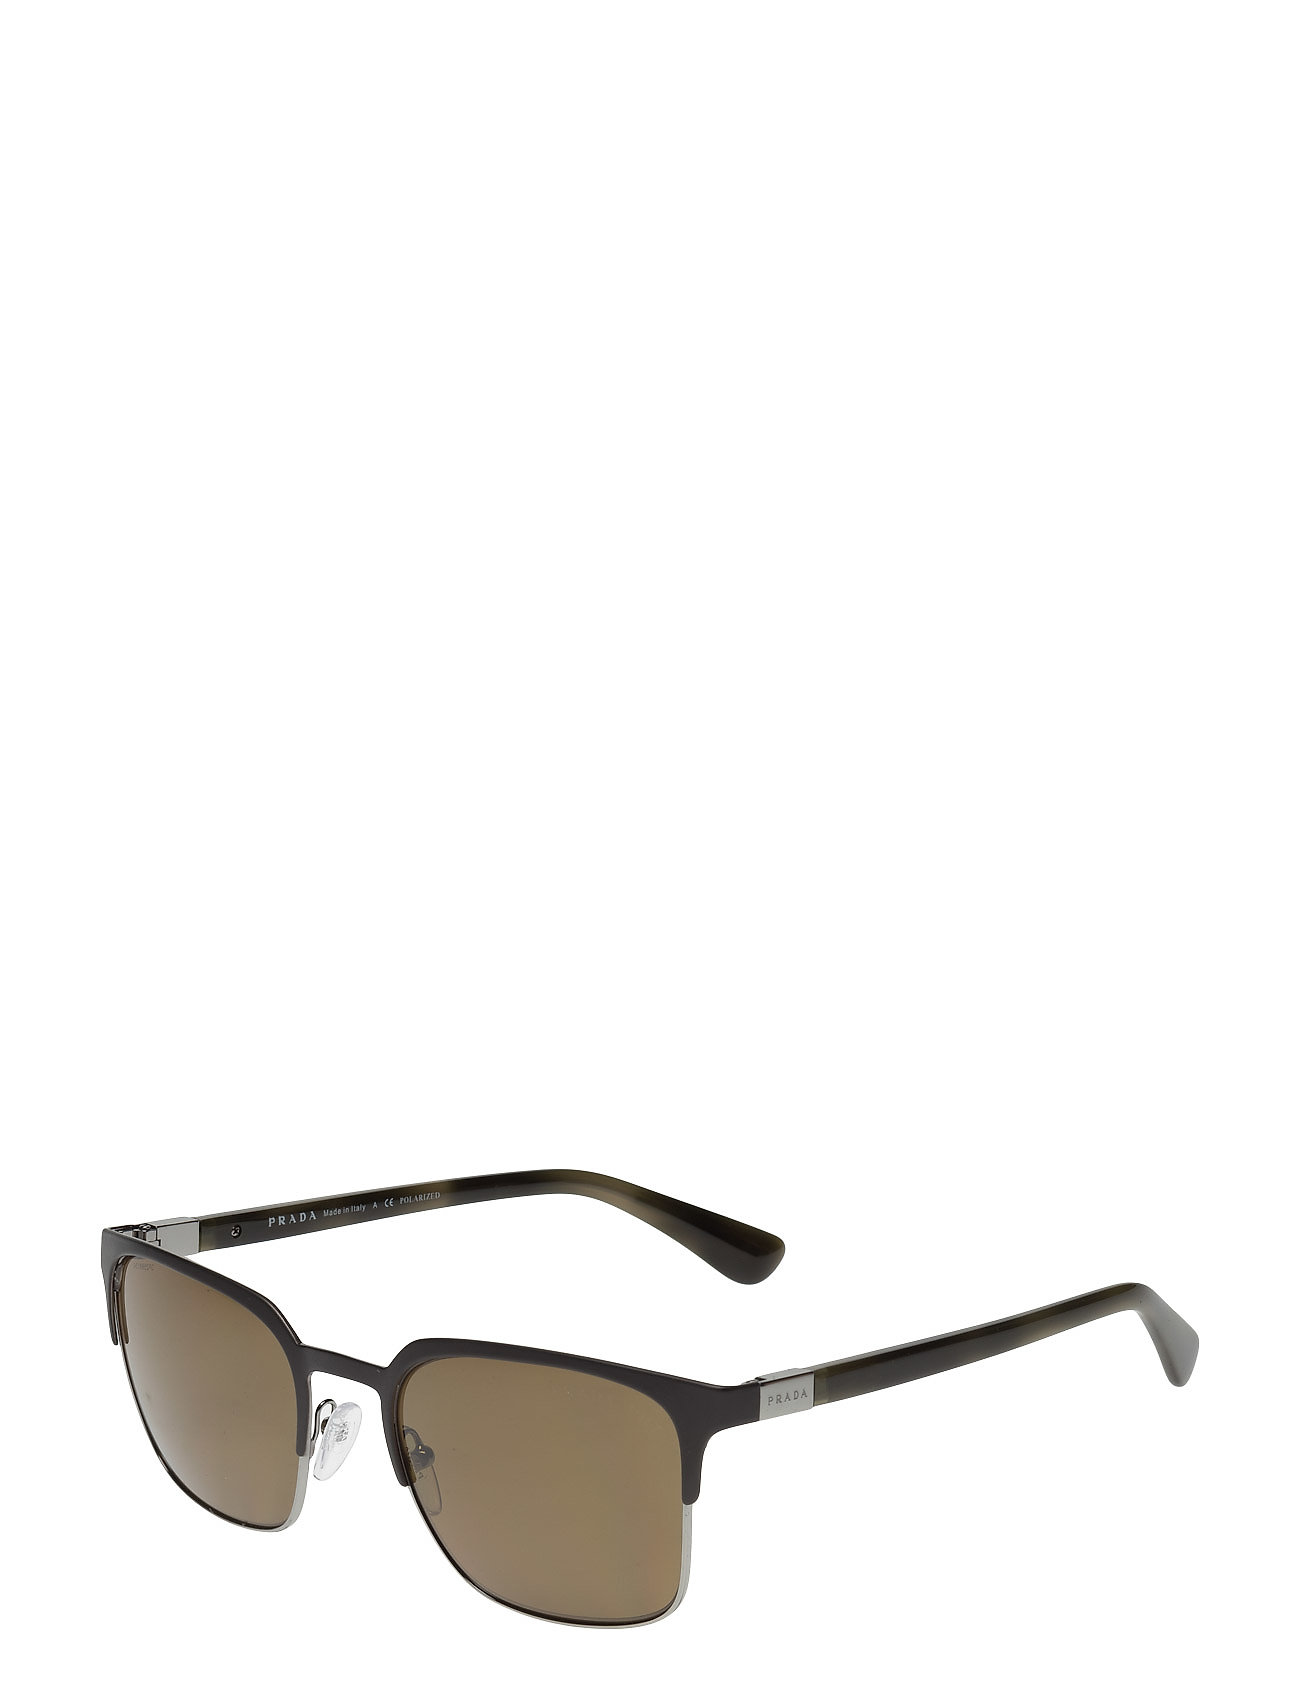 Heritage Wayfarer Solbriller Brun Prada Sunglasses